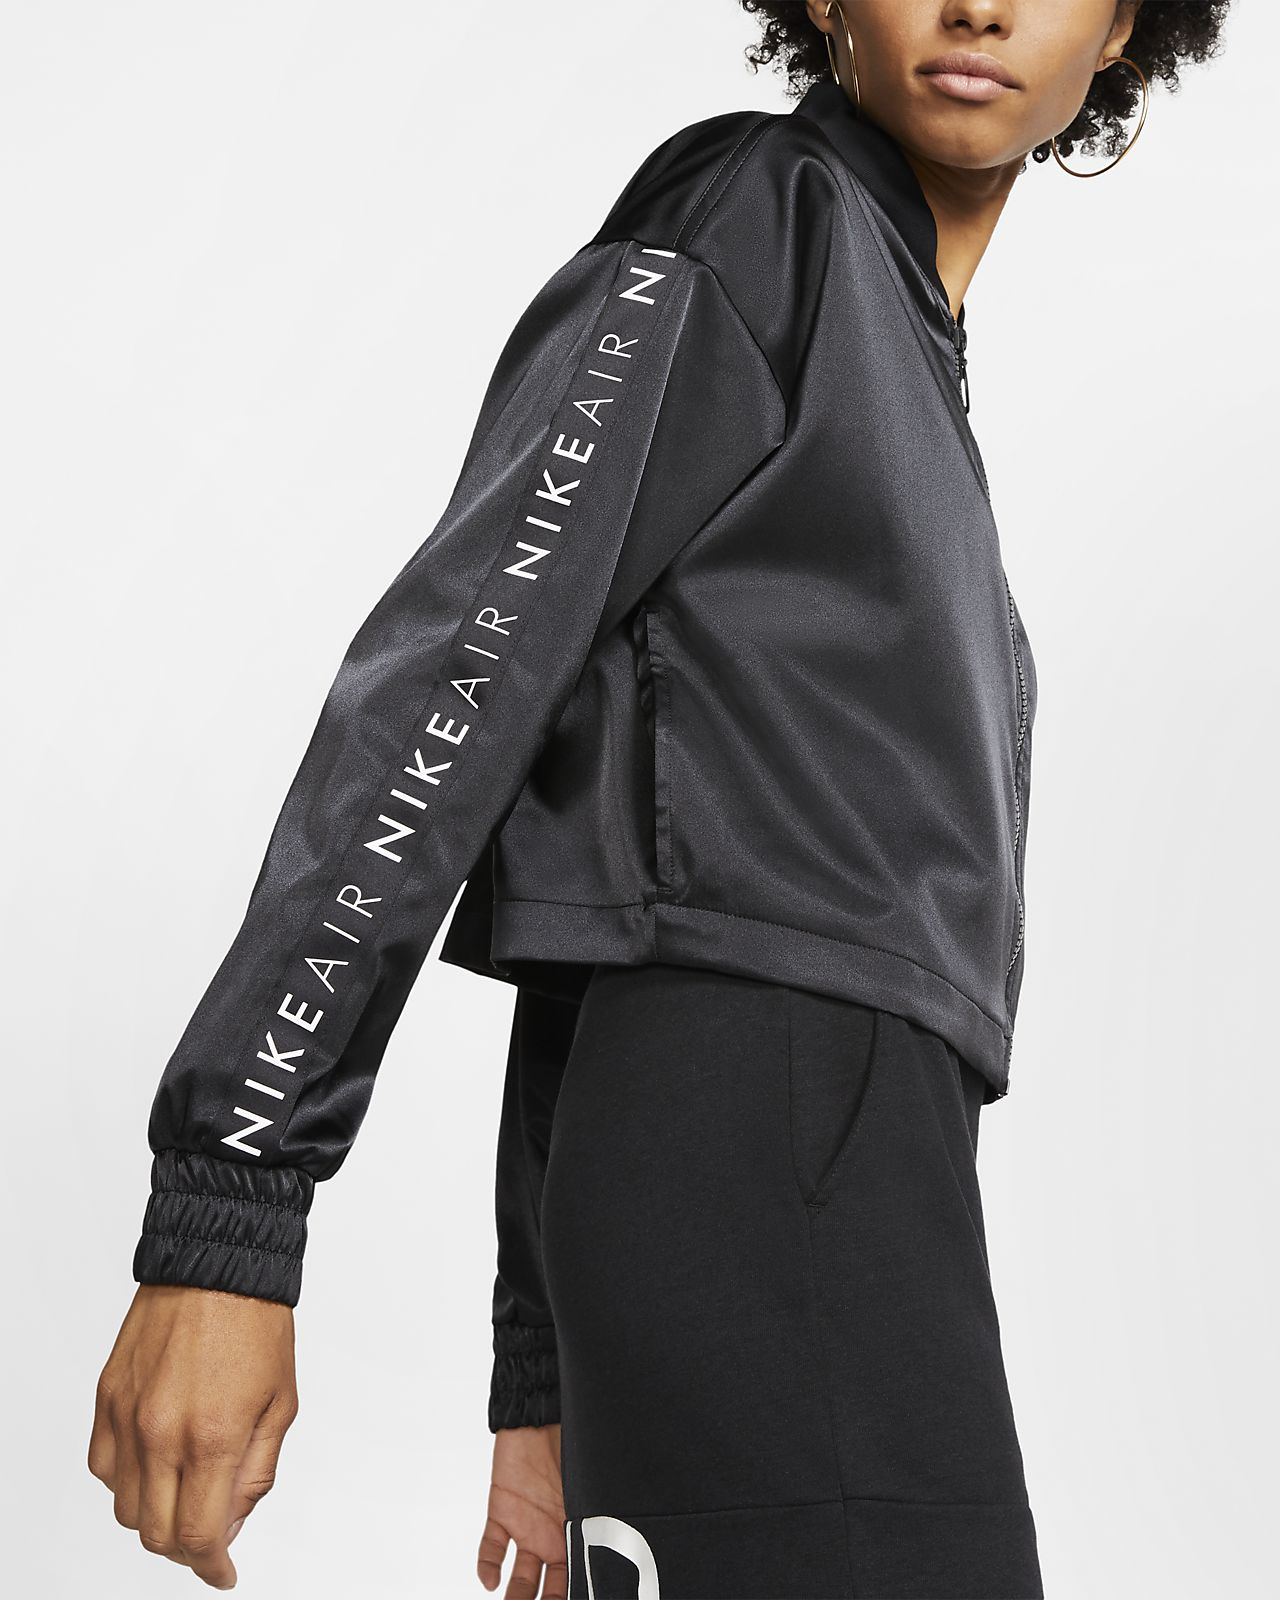 Nike Air Satin Trainingsjacke für Damen